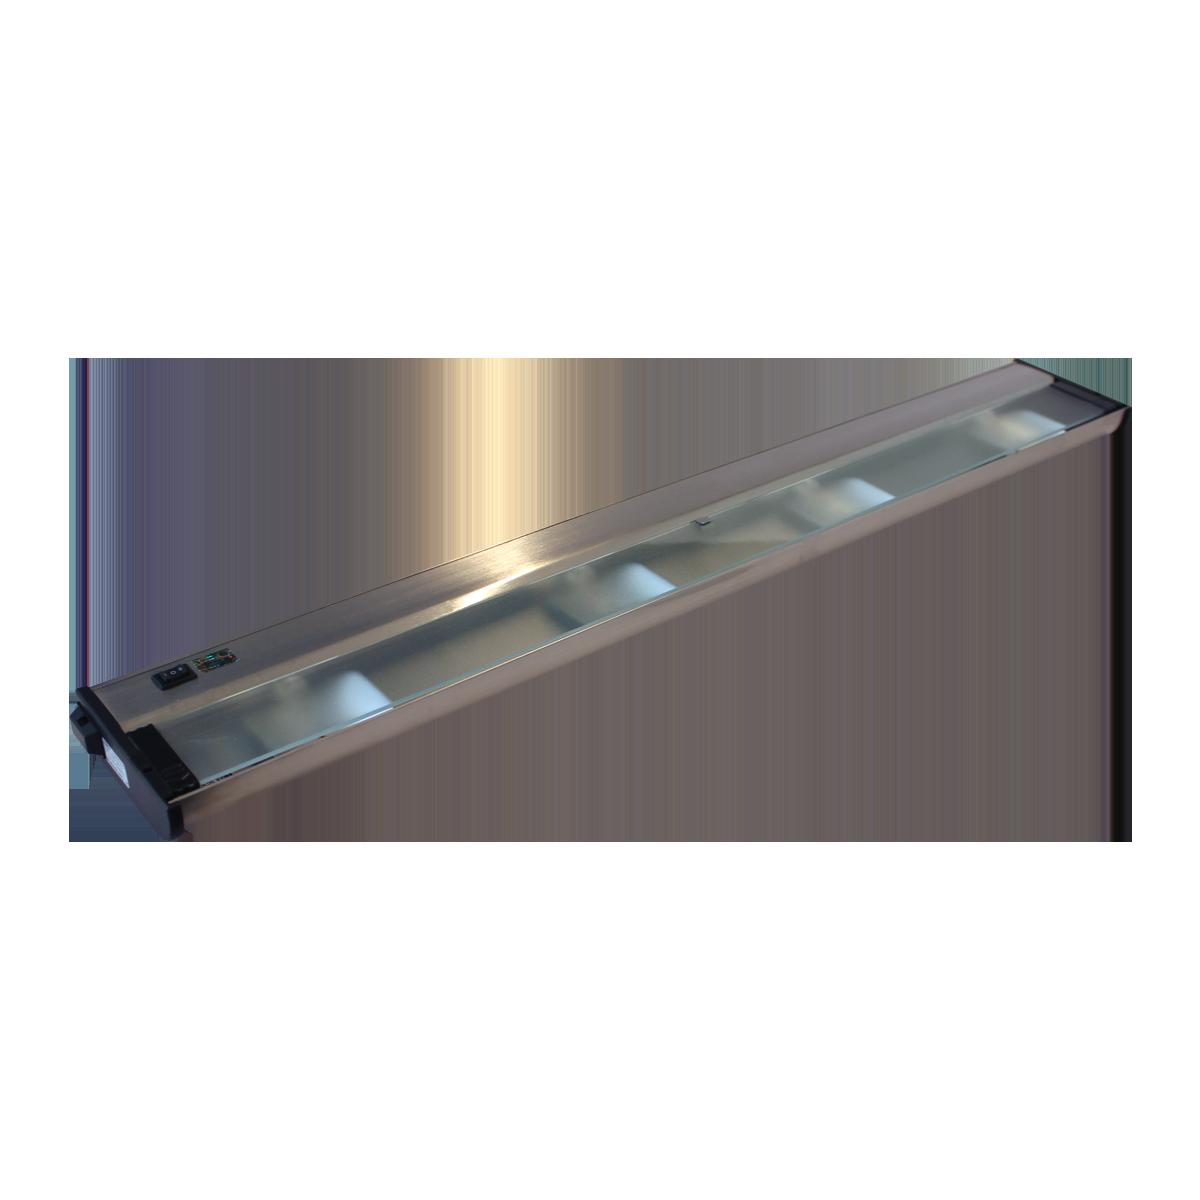 "32"" CounterAttack Xenon Under Cabinet, Stainless Steel Finish, QuickLink©"